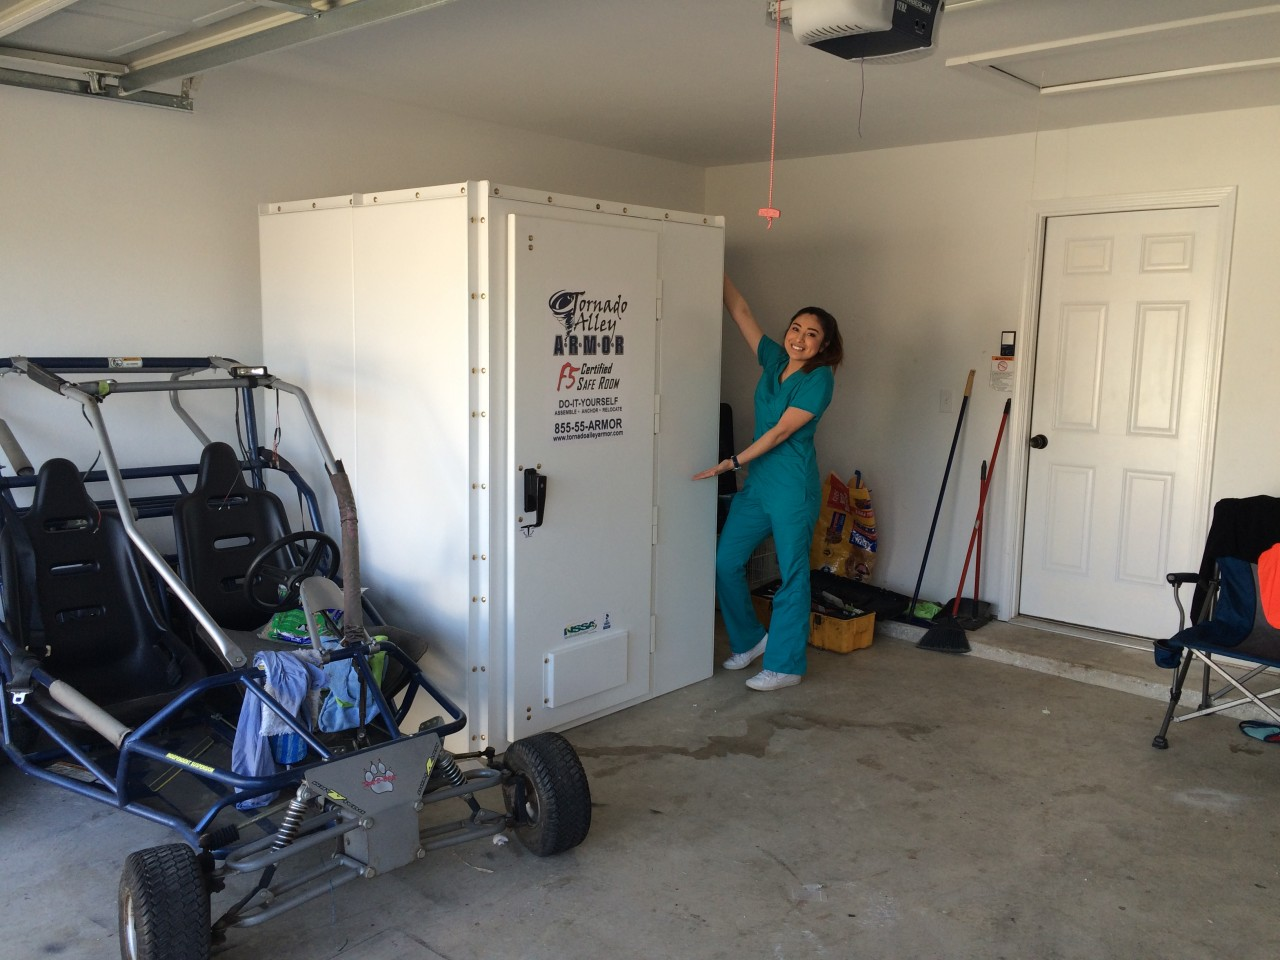 Diy do it yourself tornado safe room customer install for Buy safe room